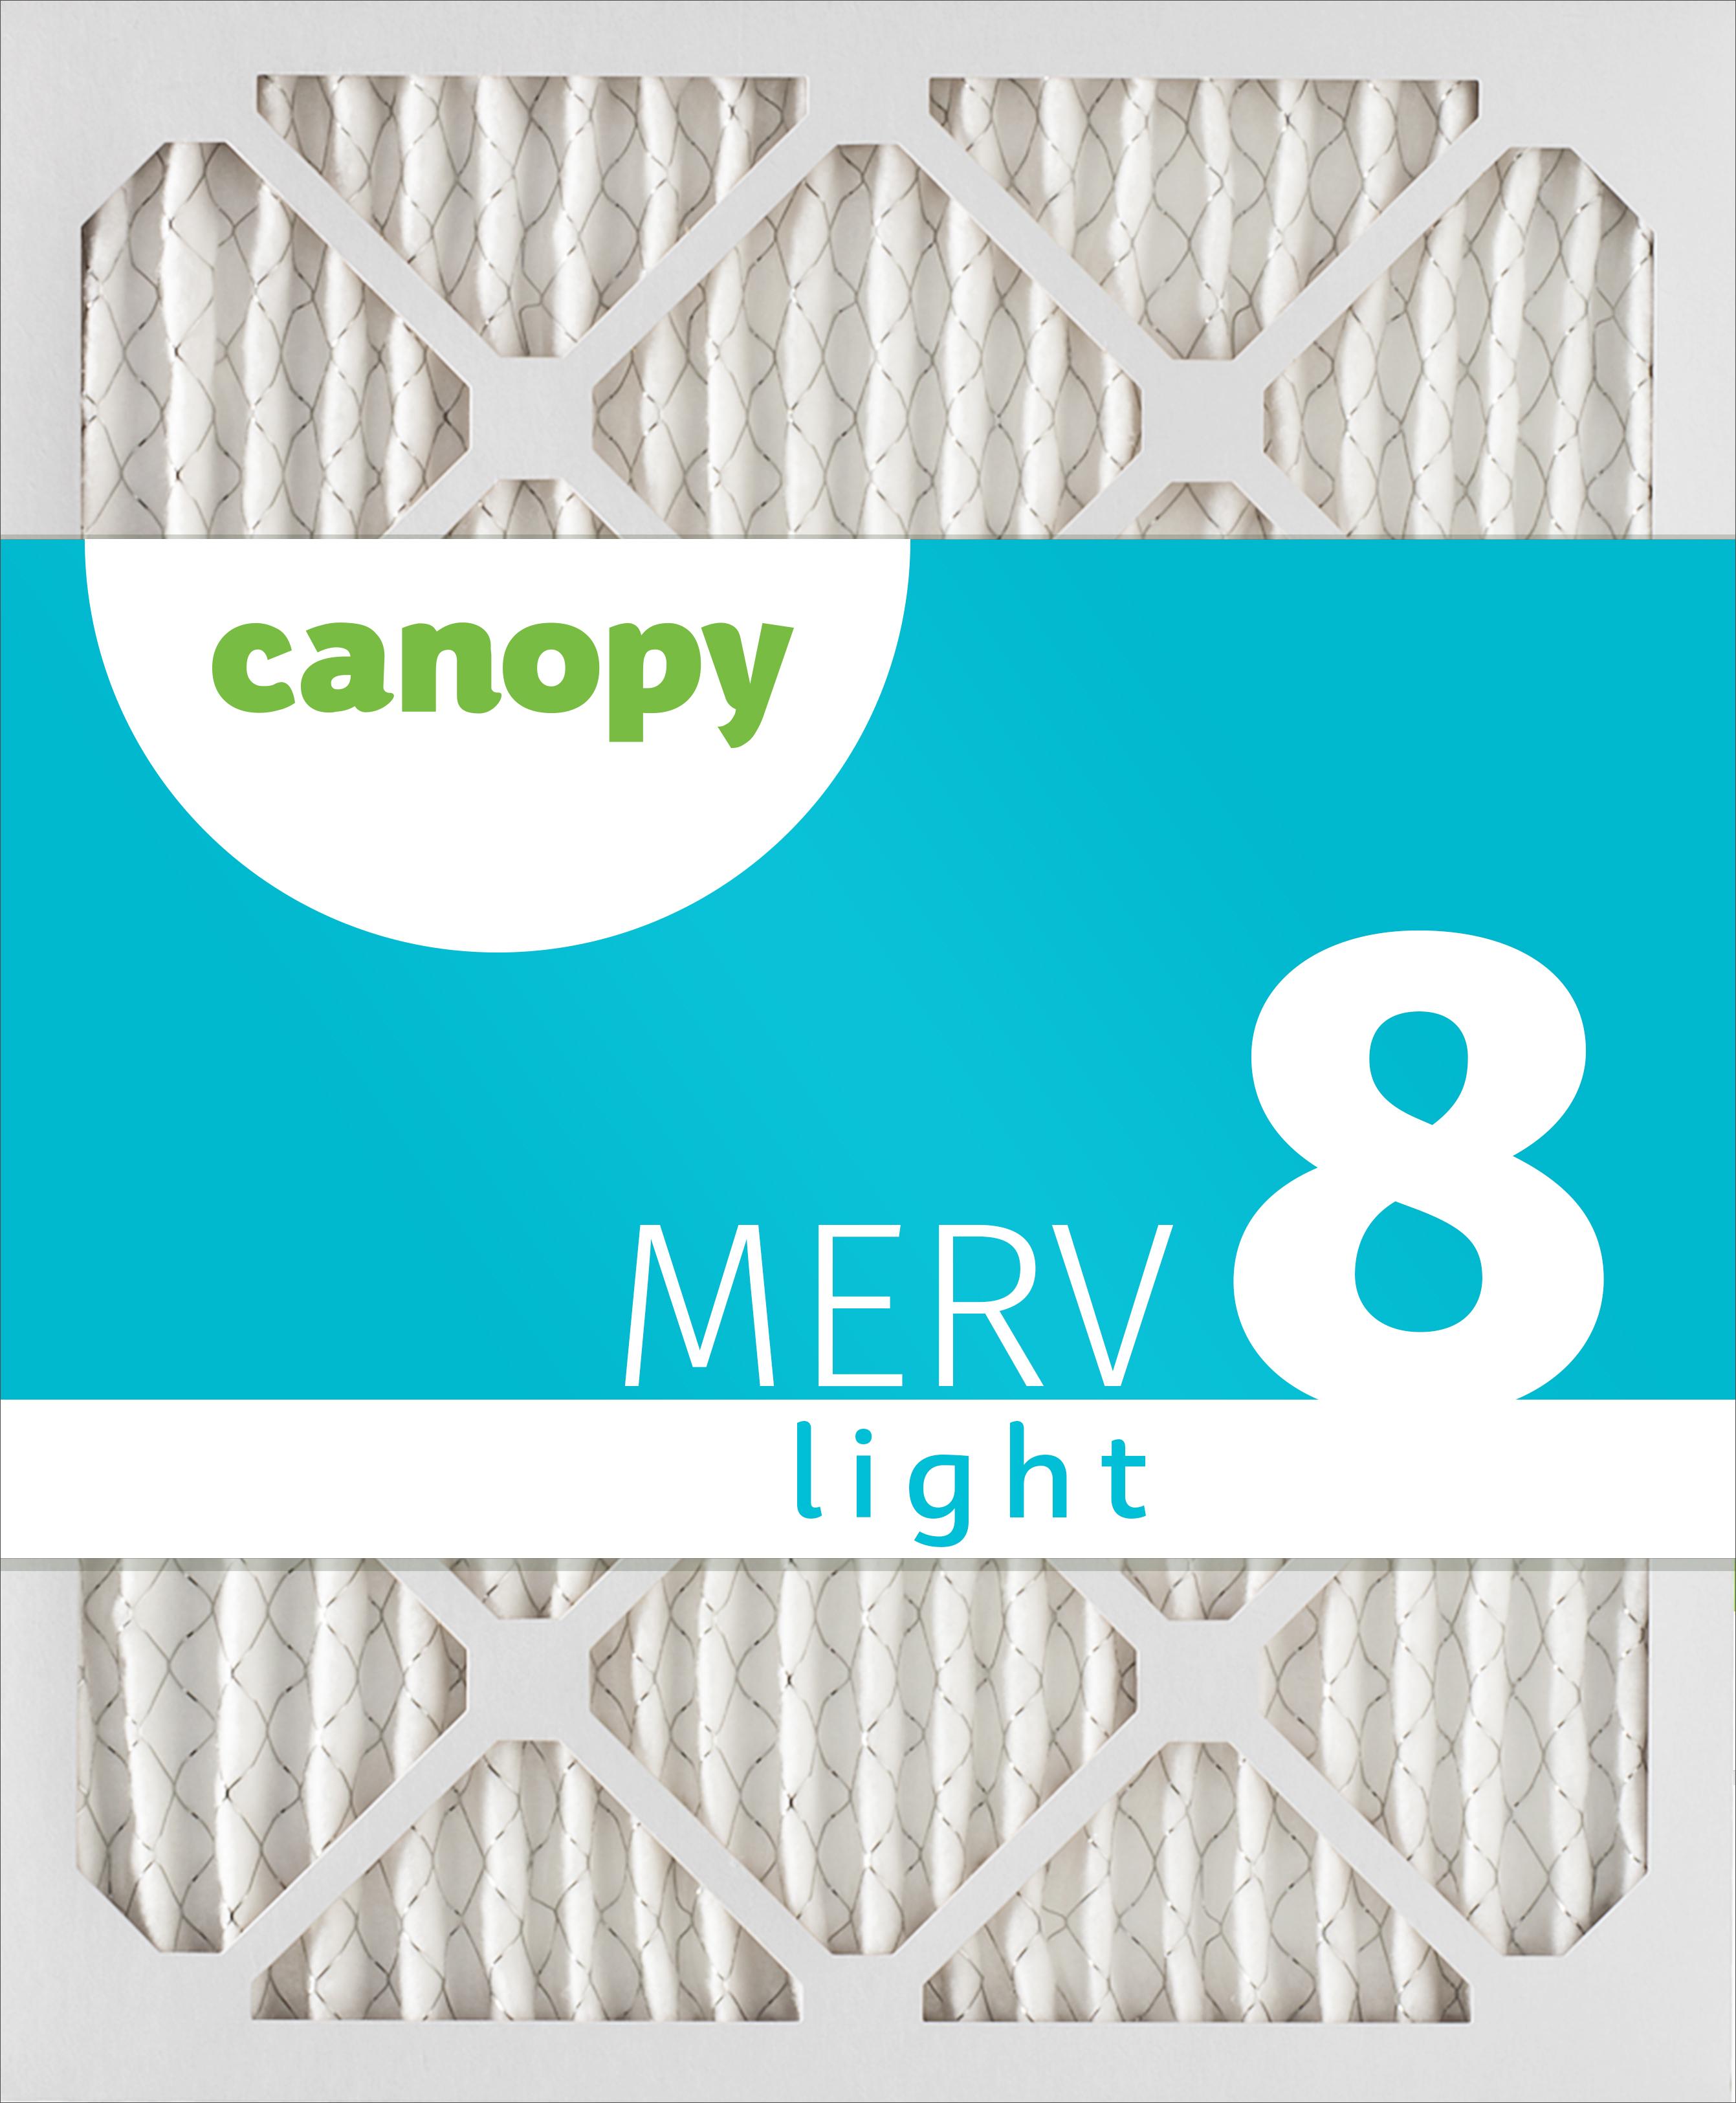 Canopy 12x30x1 MERV  8 Air Filter 12x30x1 Box of 4